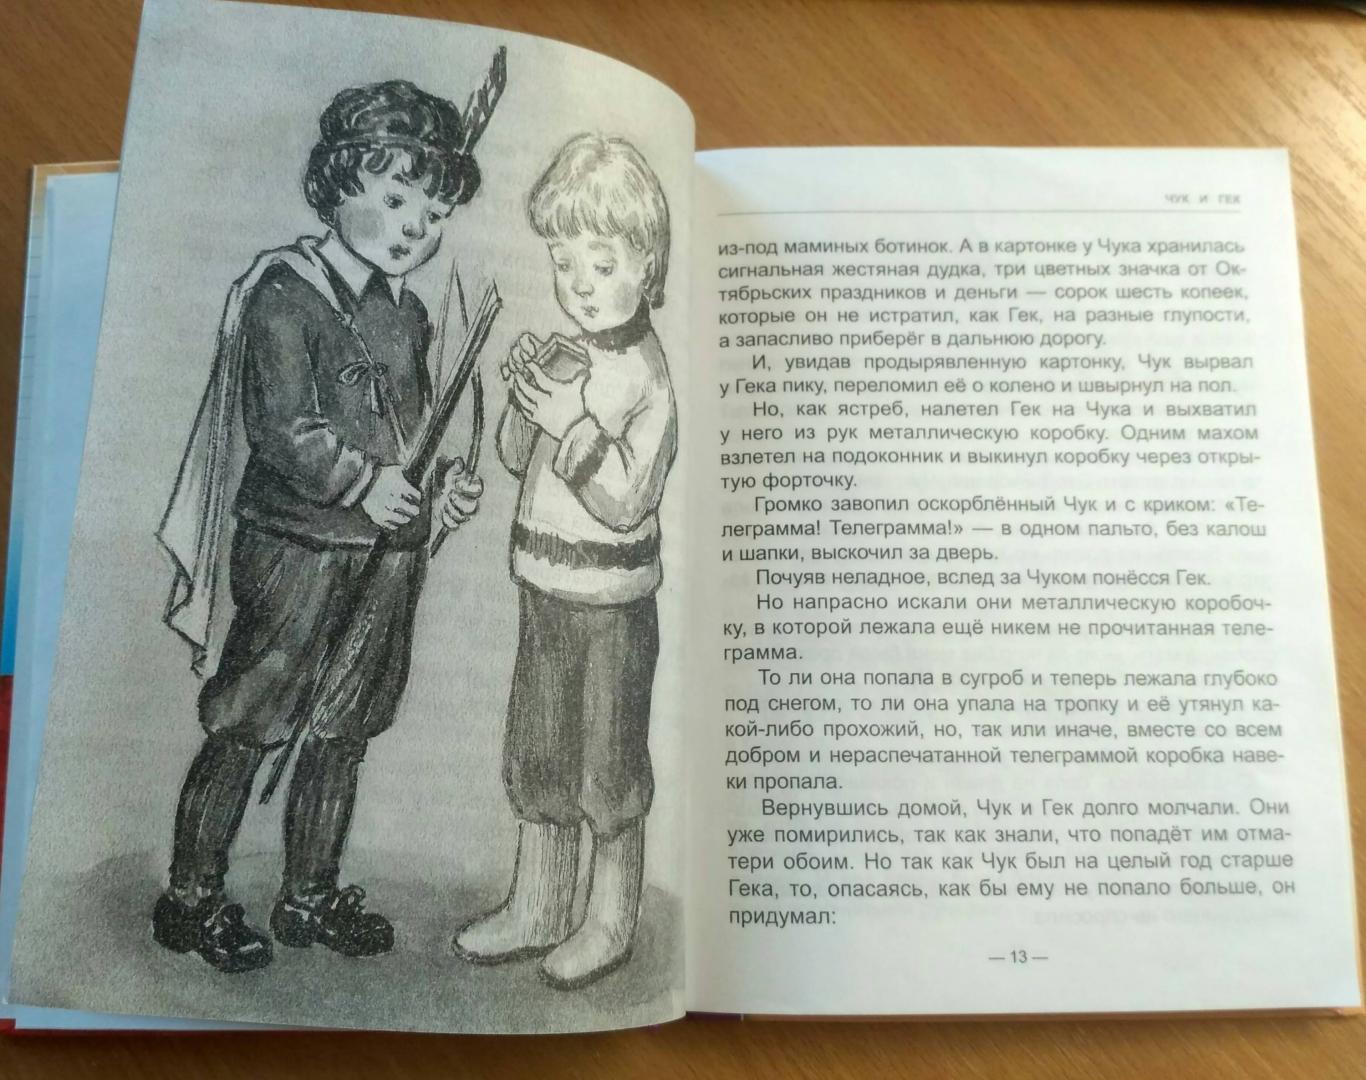 Иллюстрация 18 из 20 для Чук и Гек - Аркадий Гайдар | Лабиринт - книги. Источник: Климанова  Альбина Равилевна